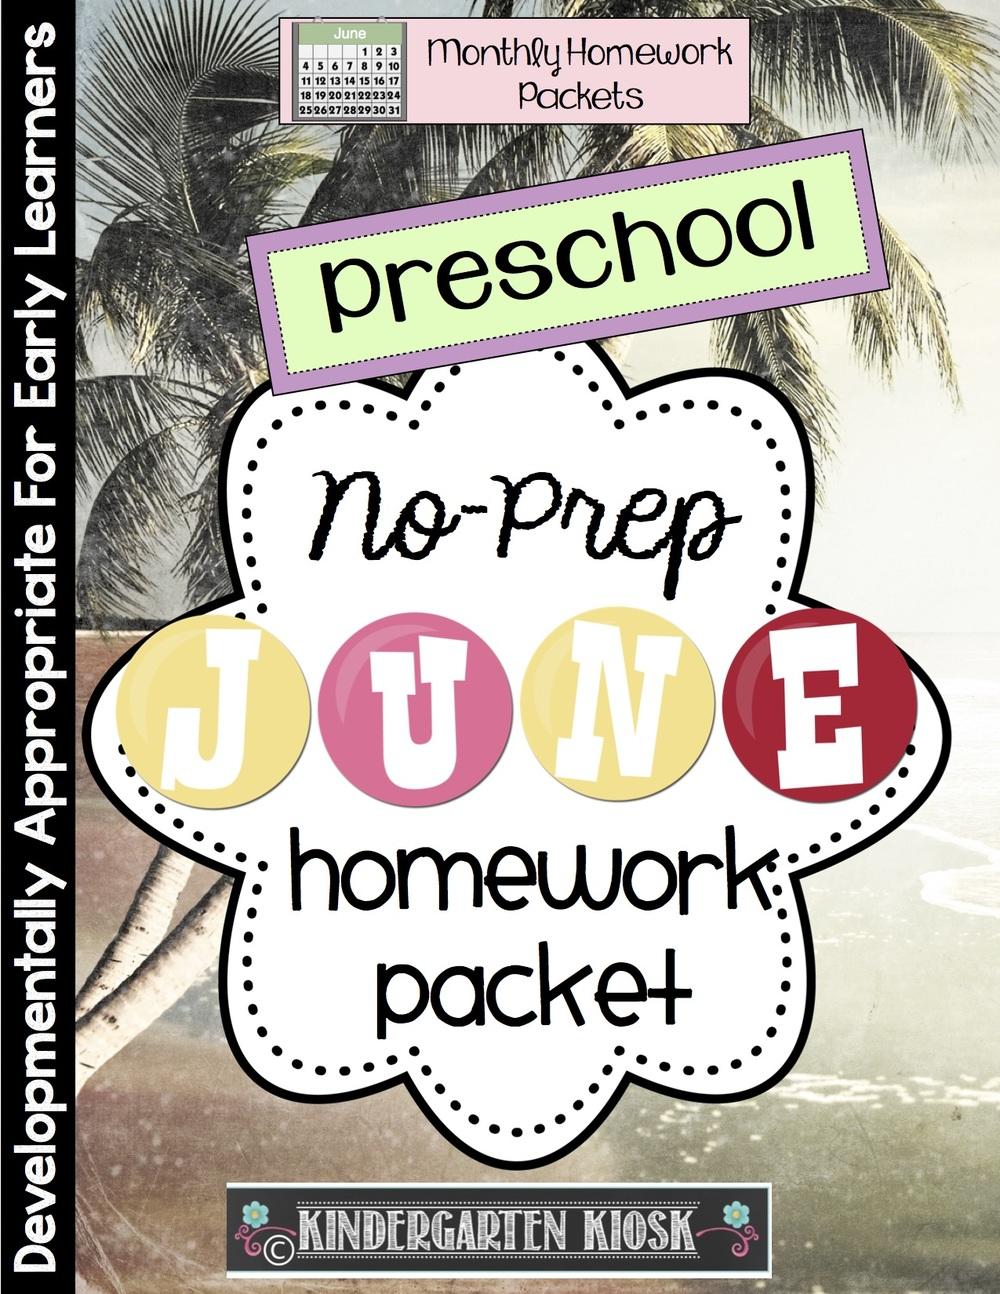 June Preschool Homework Packet  U2014 Kindergarten Kiosk